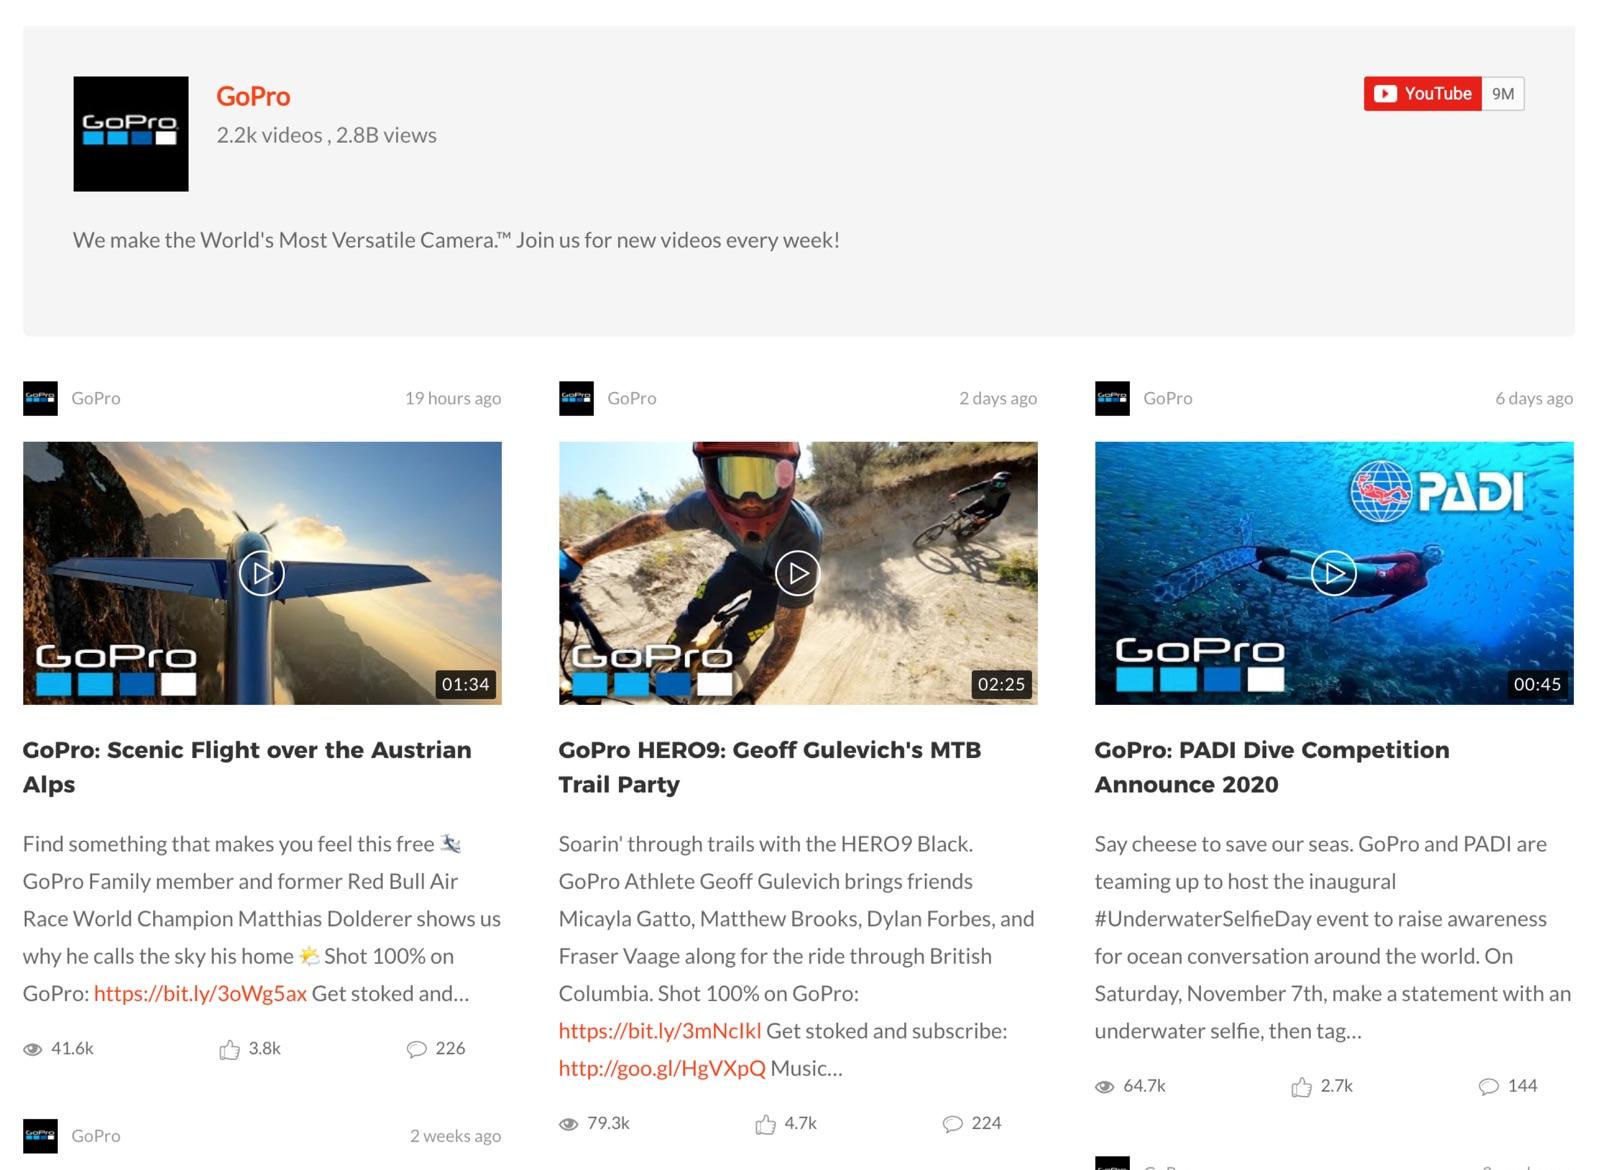 YouTube Gallery/Grid